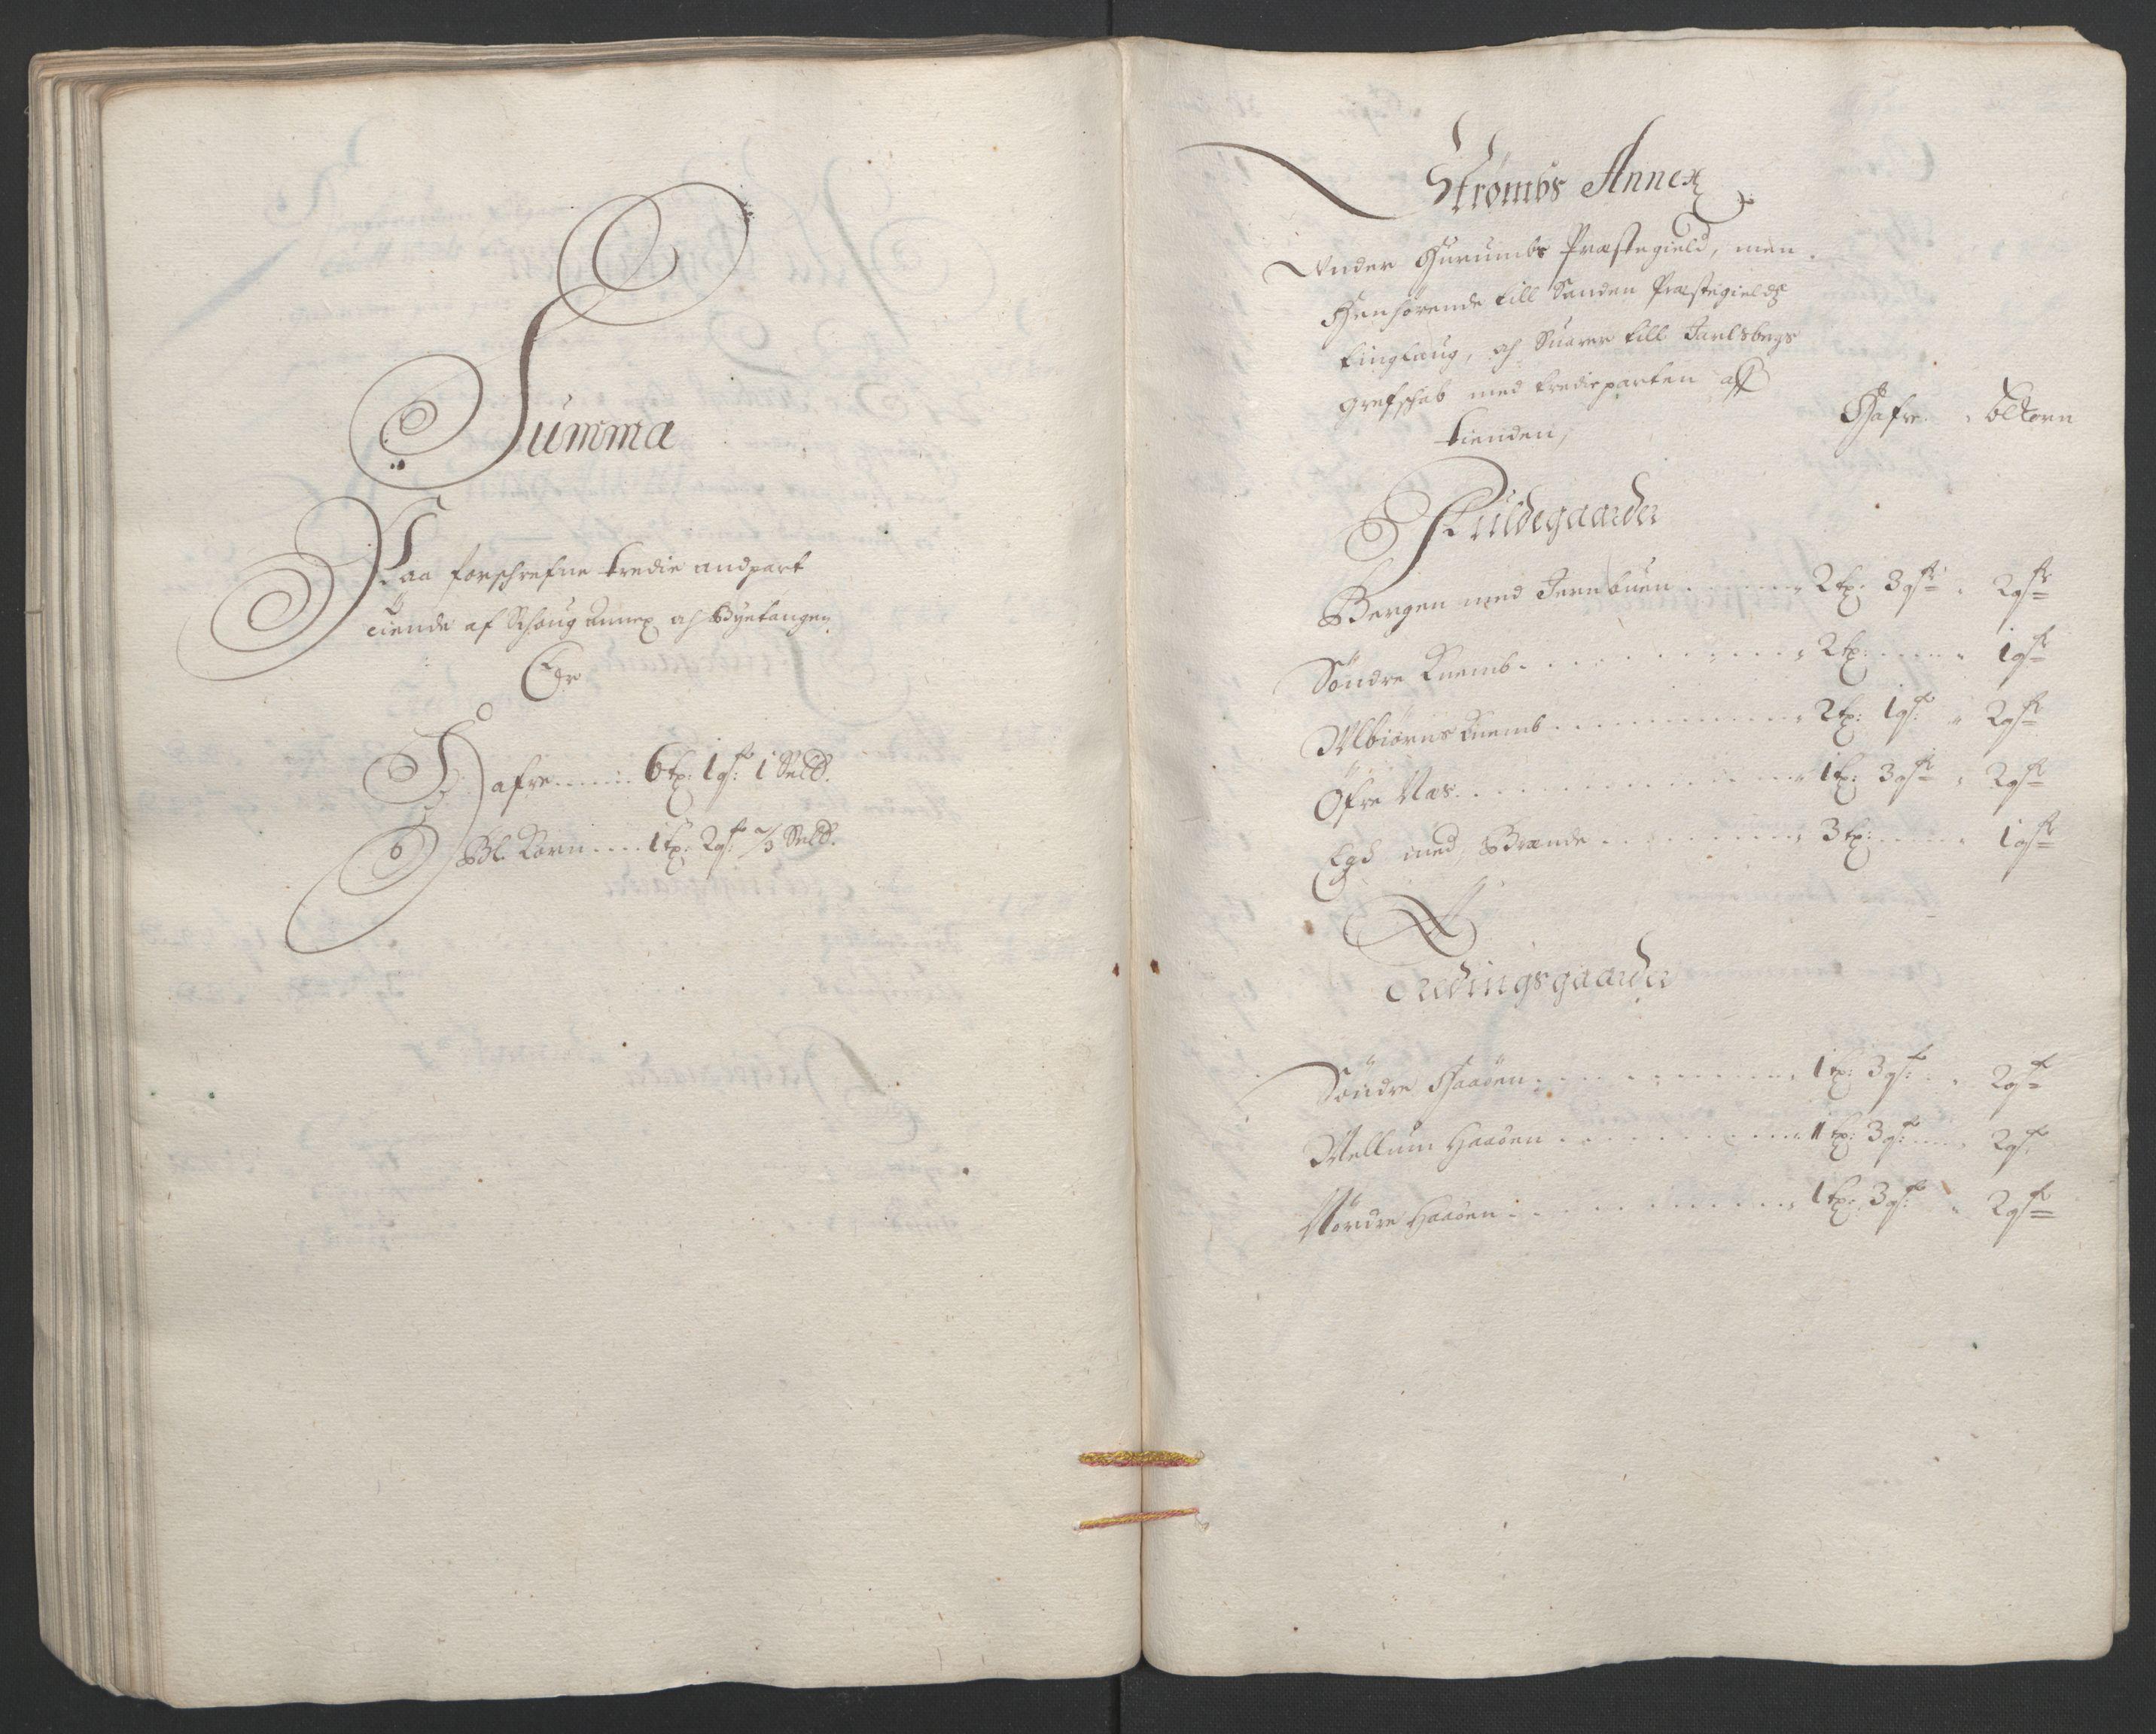 RA, Rentekammeret inntil 1814, Reviderte regnskaper, Fogderegnskap, R32/L1864: Fogderegnskap Jarlsberg grevskap, 1691, s. 407